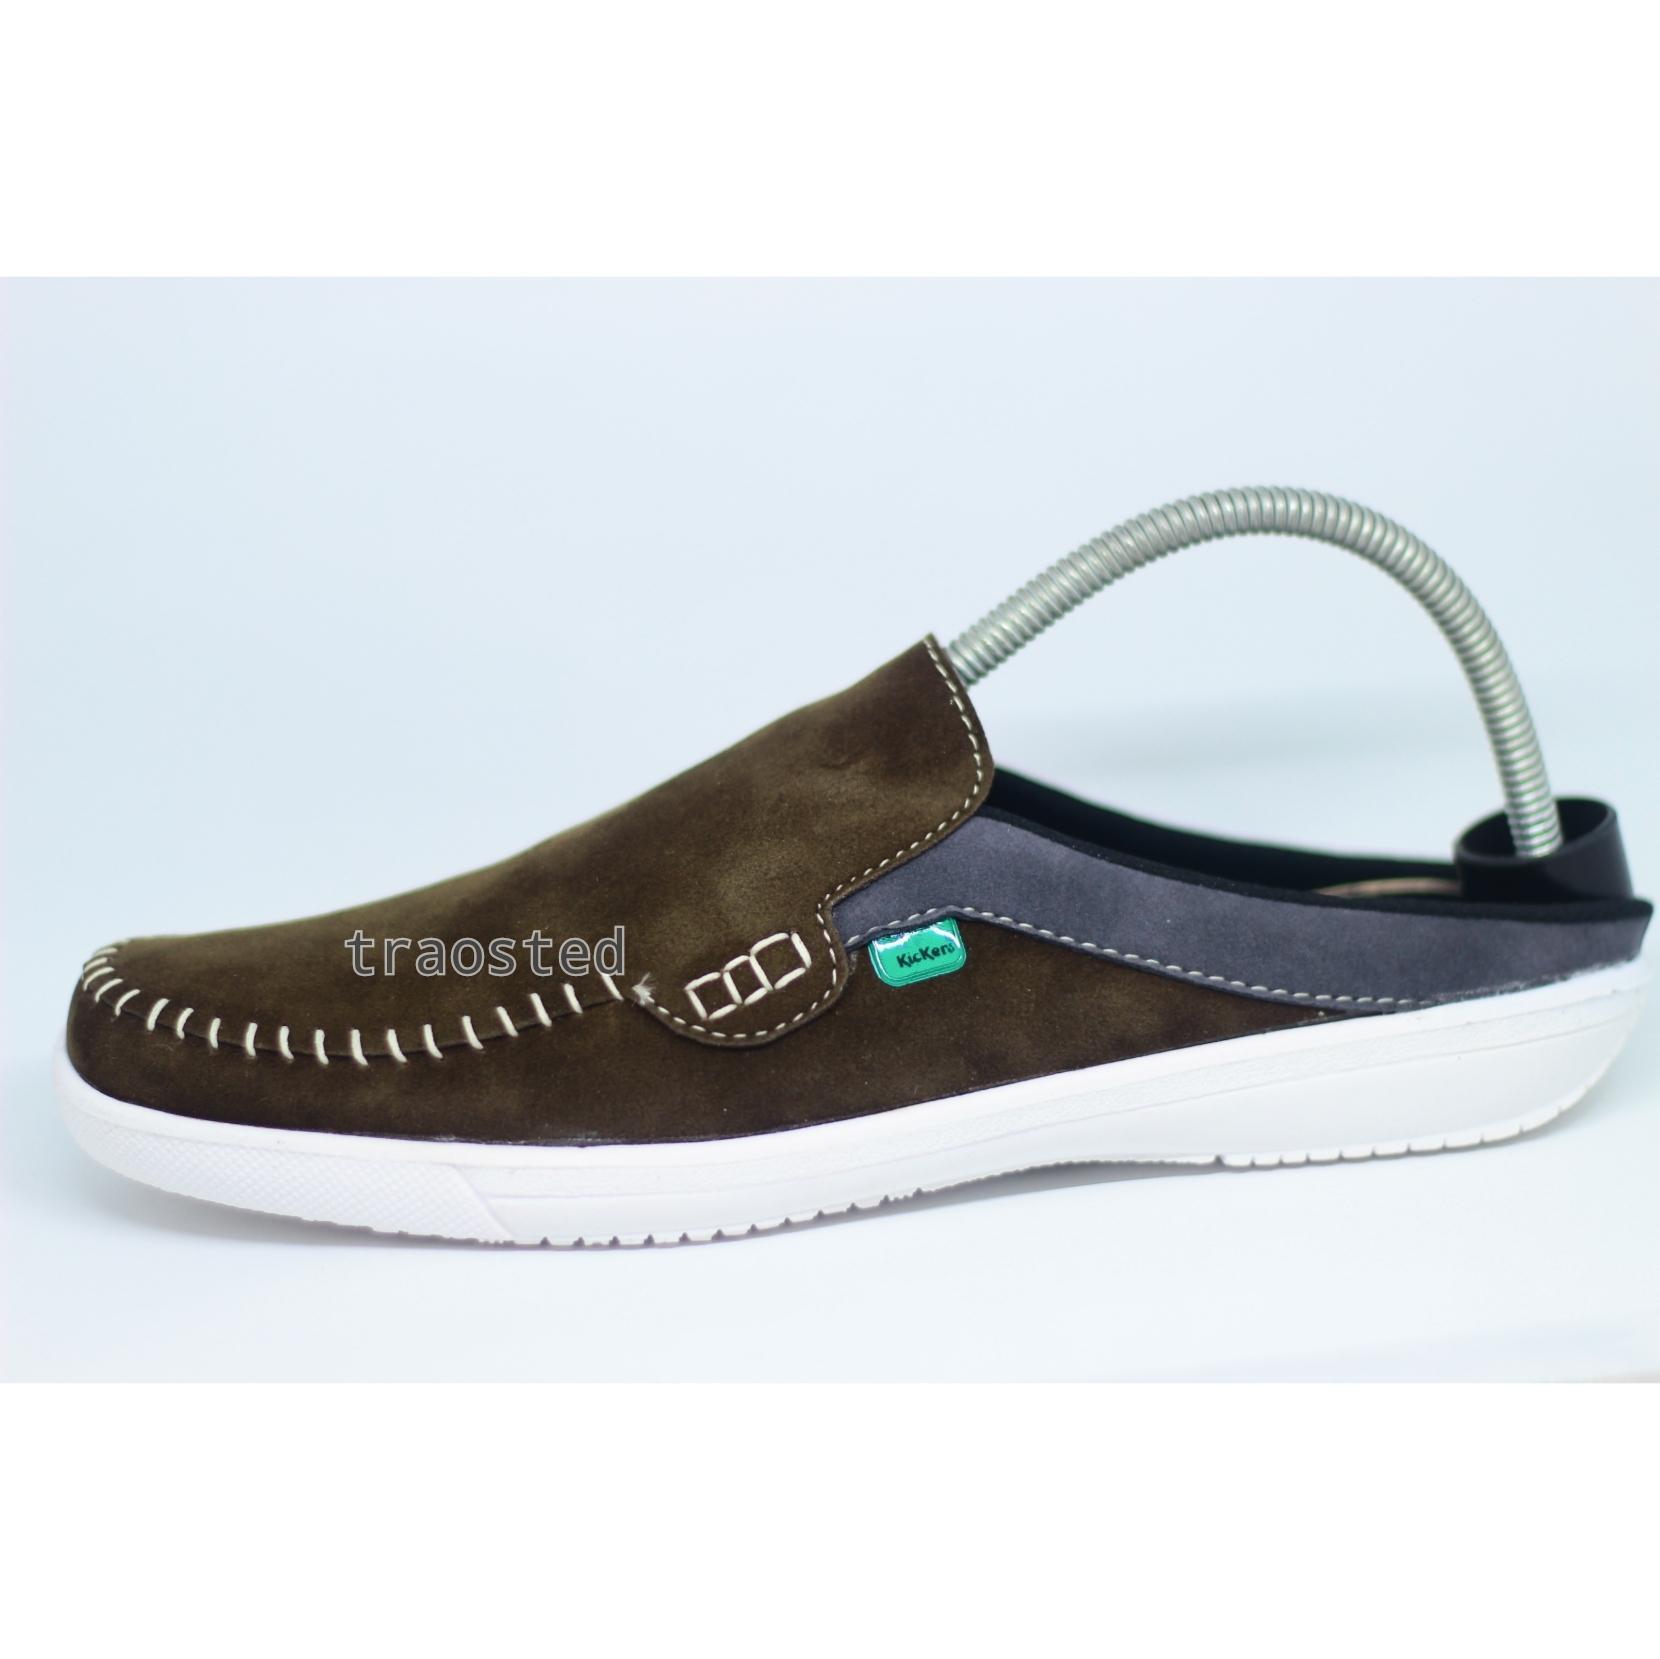 Sepatu Casual Pria Kickers Potongan Harga - Produk Terlaris 7699e65f2a